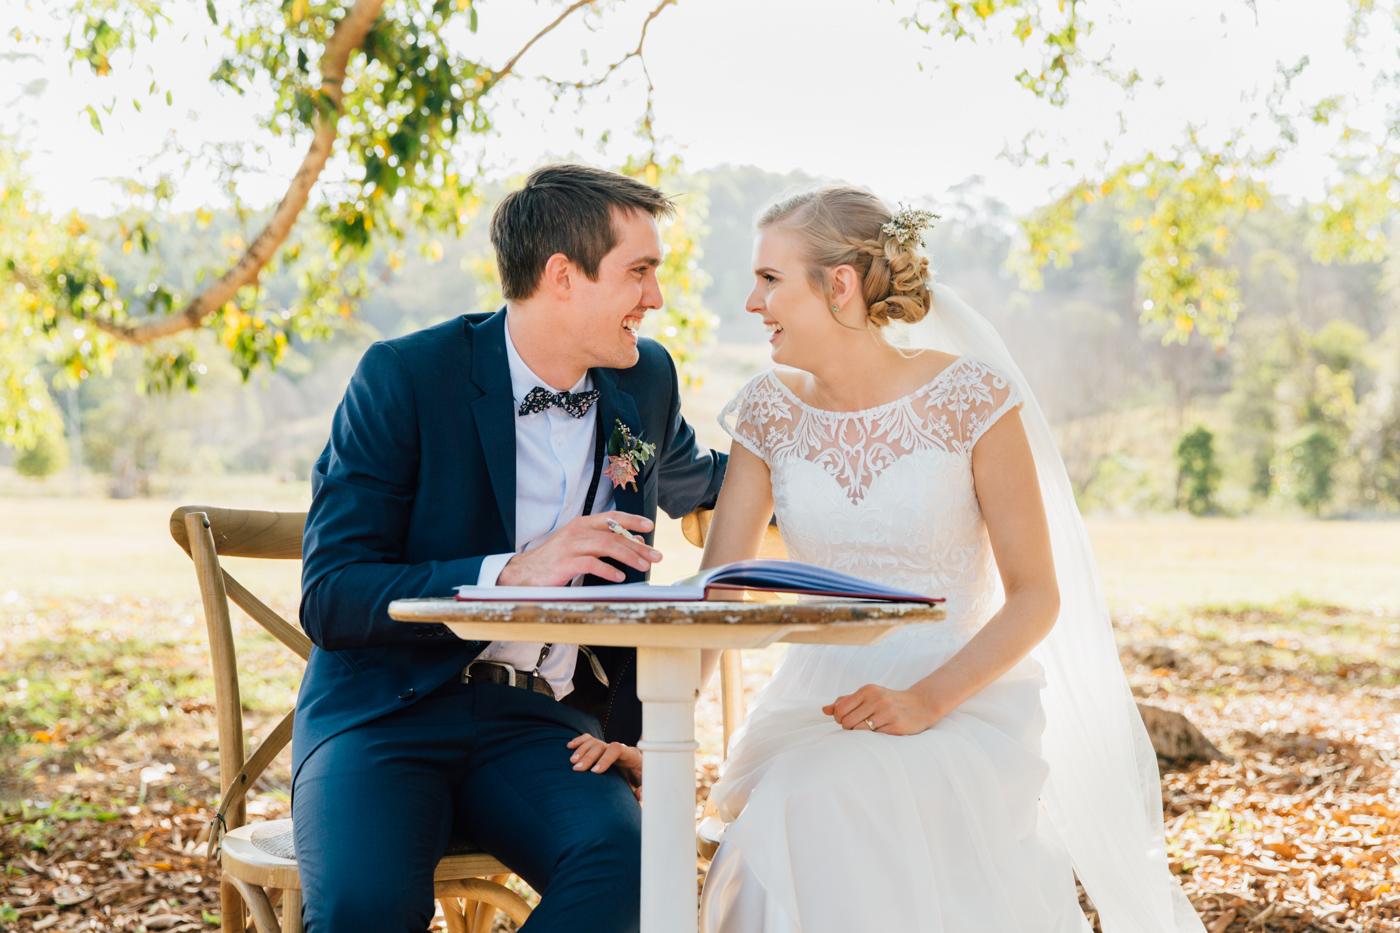 marriage certificate eloping overseas legal